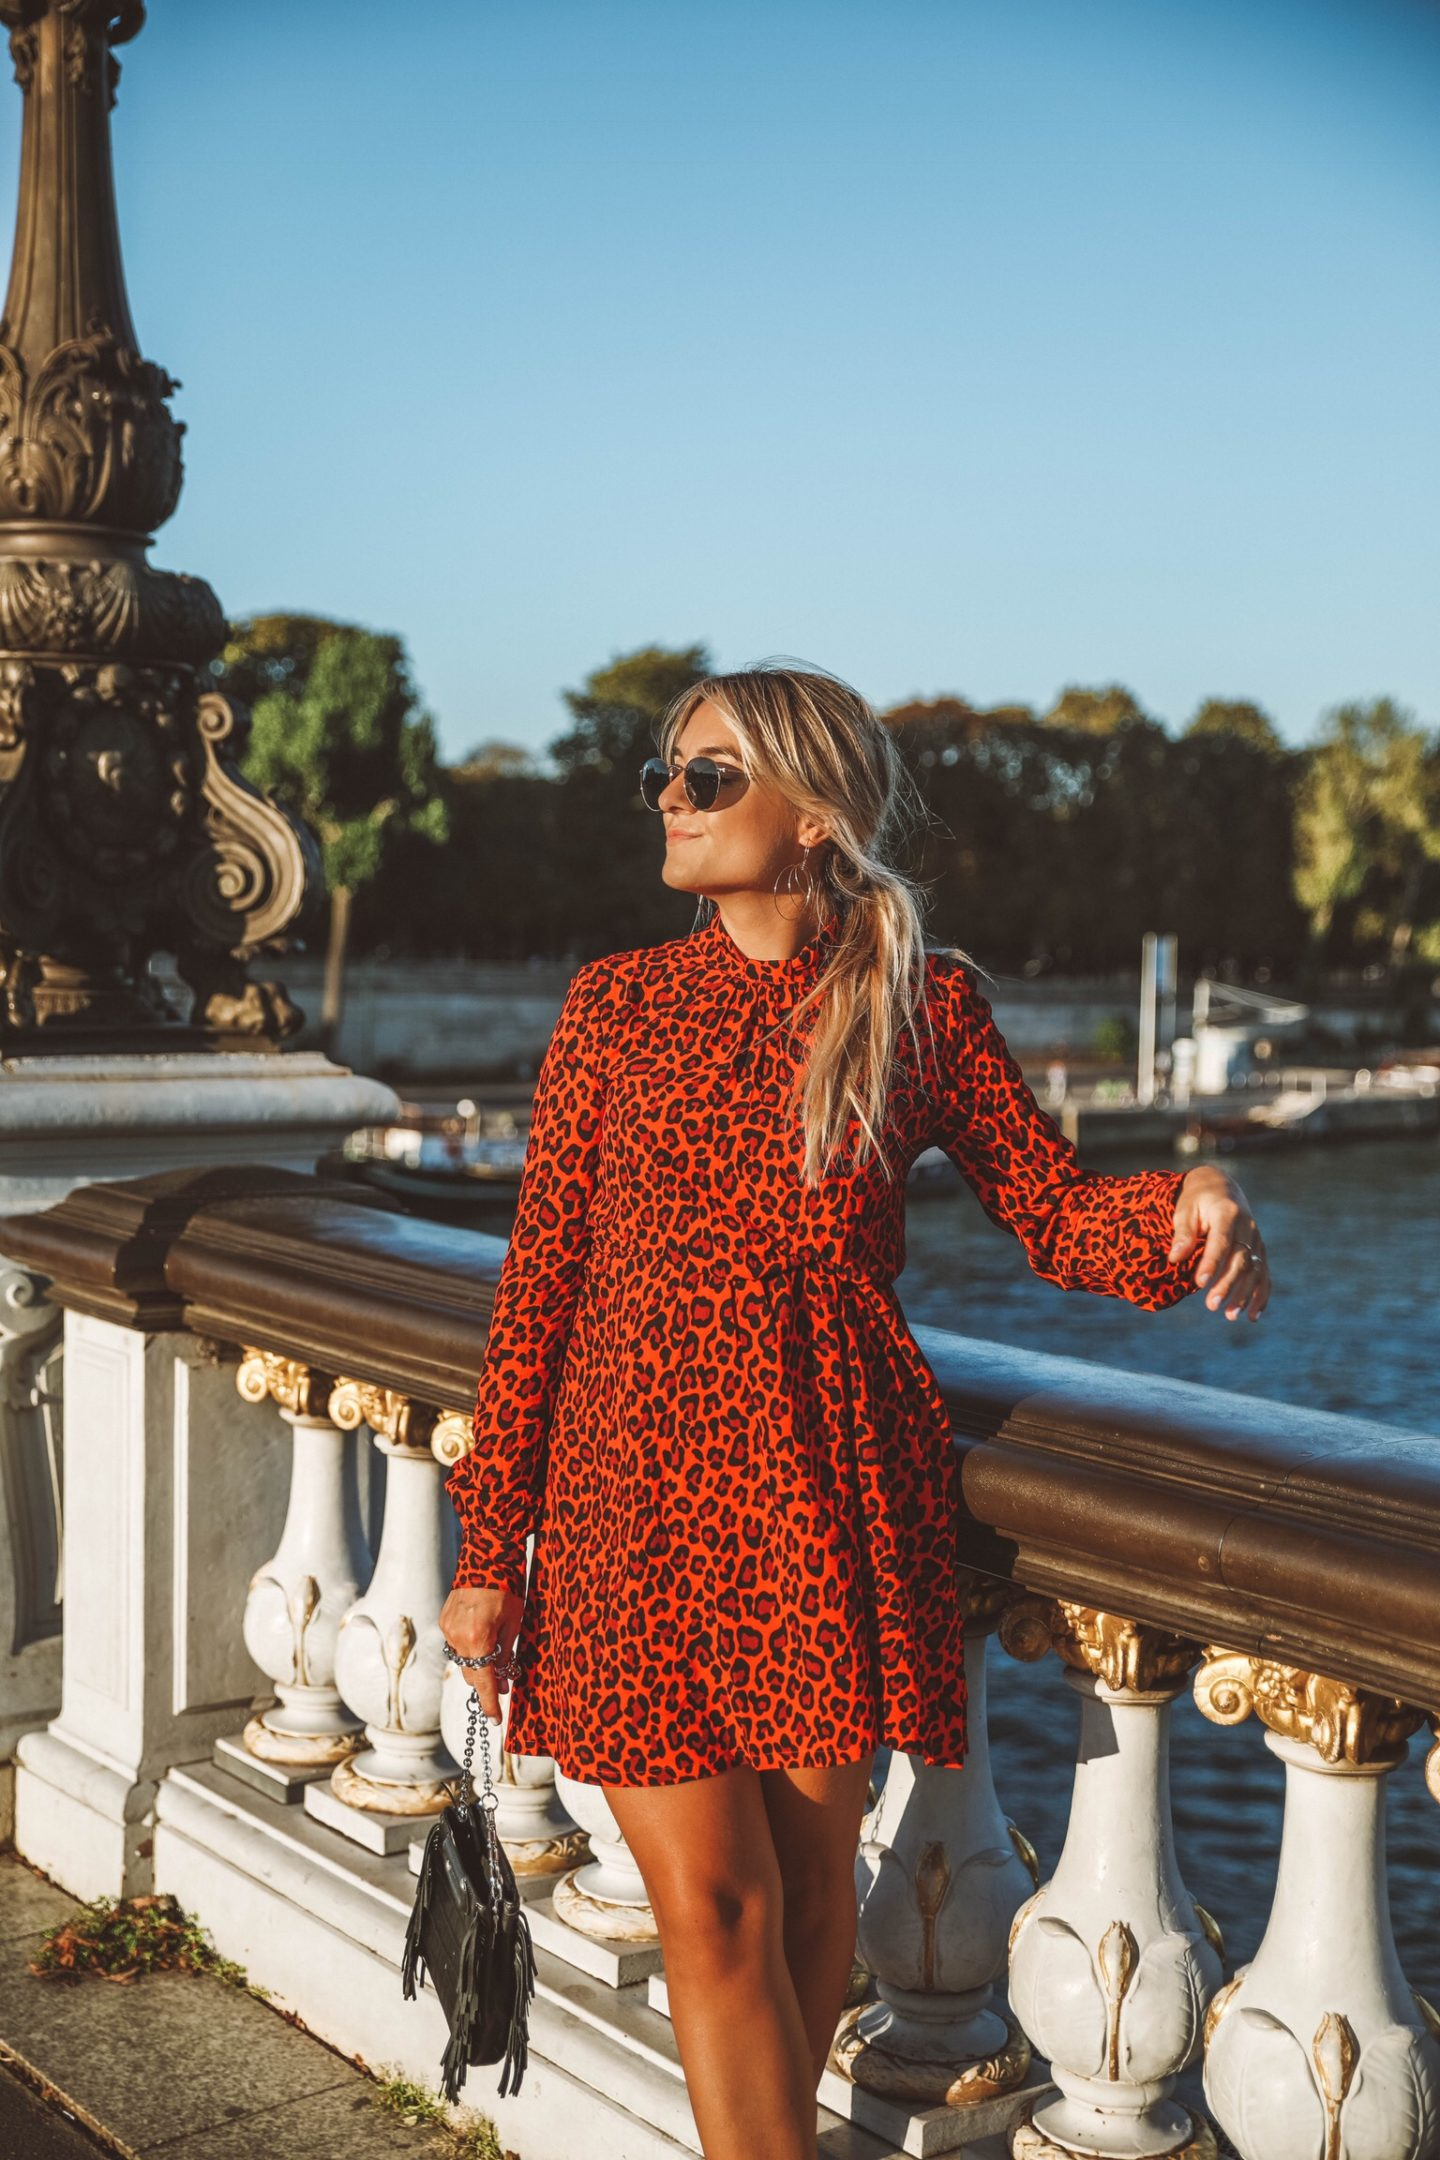 Sac M Mini Maje - Blondie Baby blog mode Paris et voyages